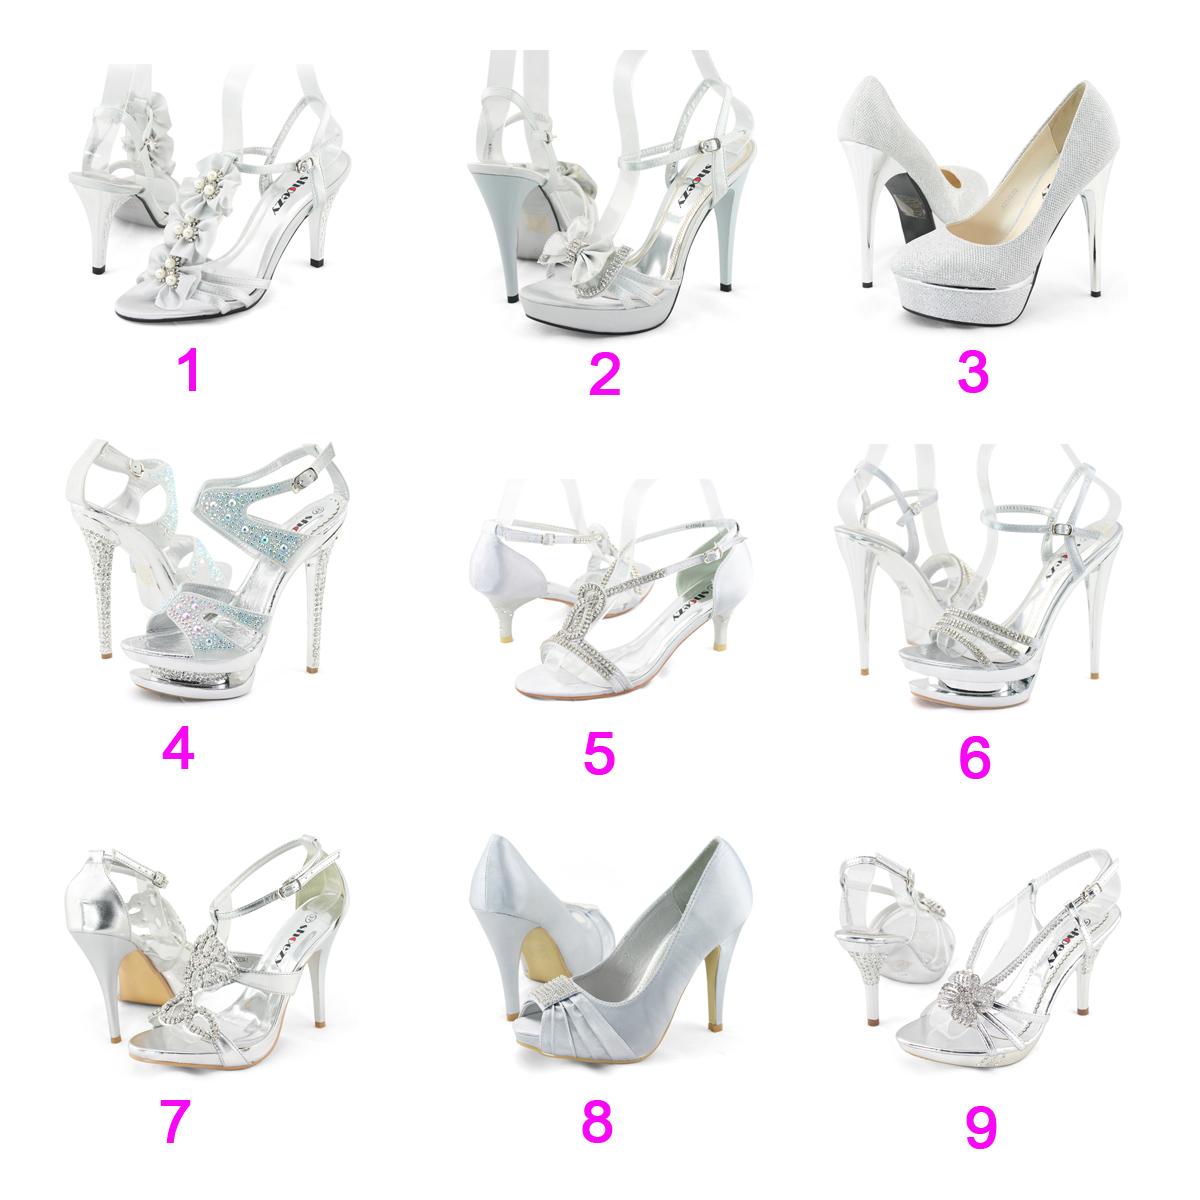 silver high heels for bridesmaids silver heels for wedding Silver High Heels For Bridesmaids